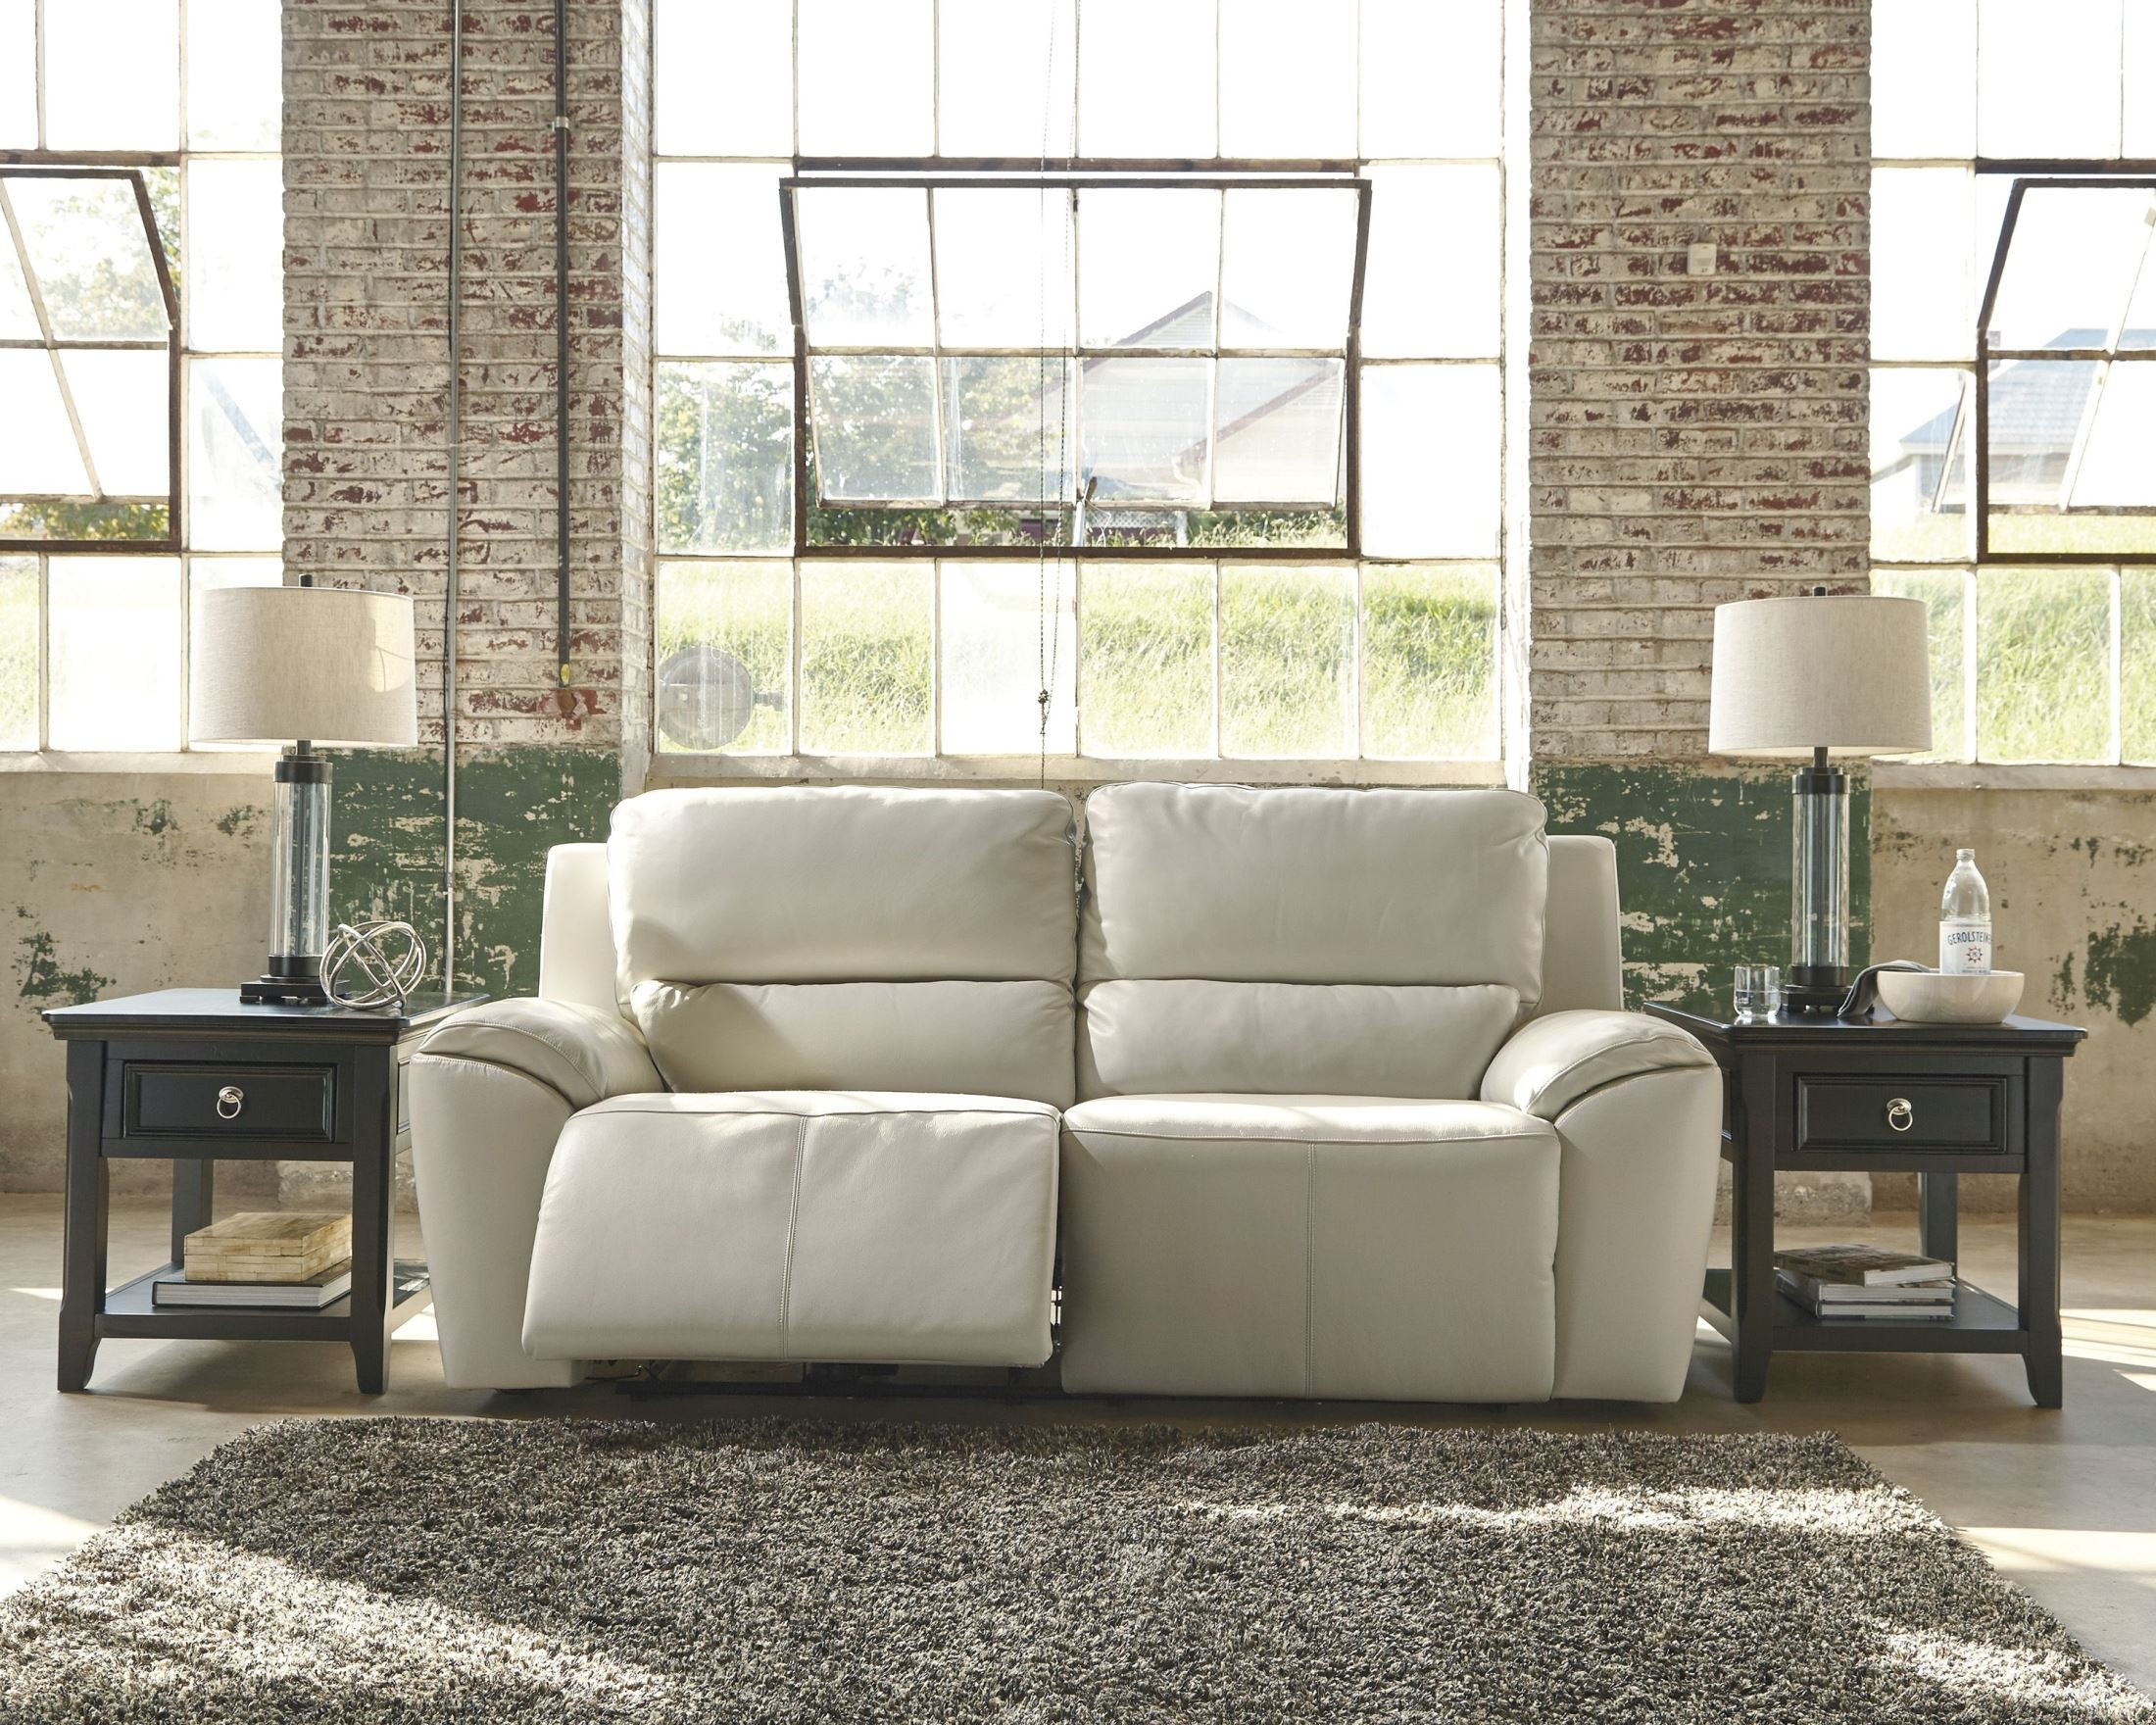 cream colored leather sofas baby blue crushed velvet sofa valeton 2 seat power reclining from ashley